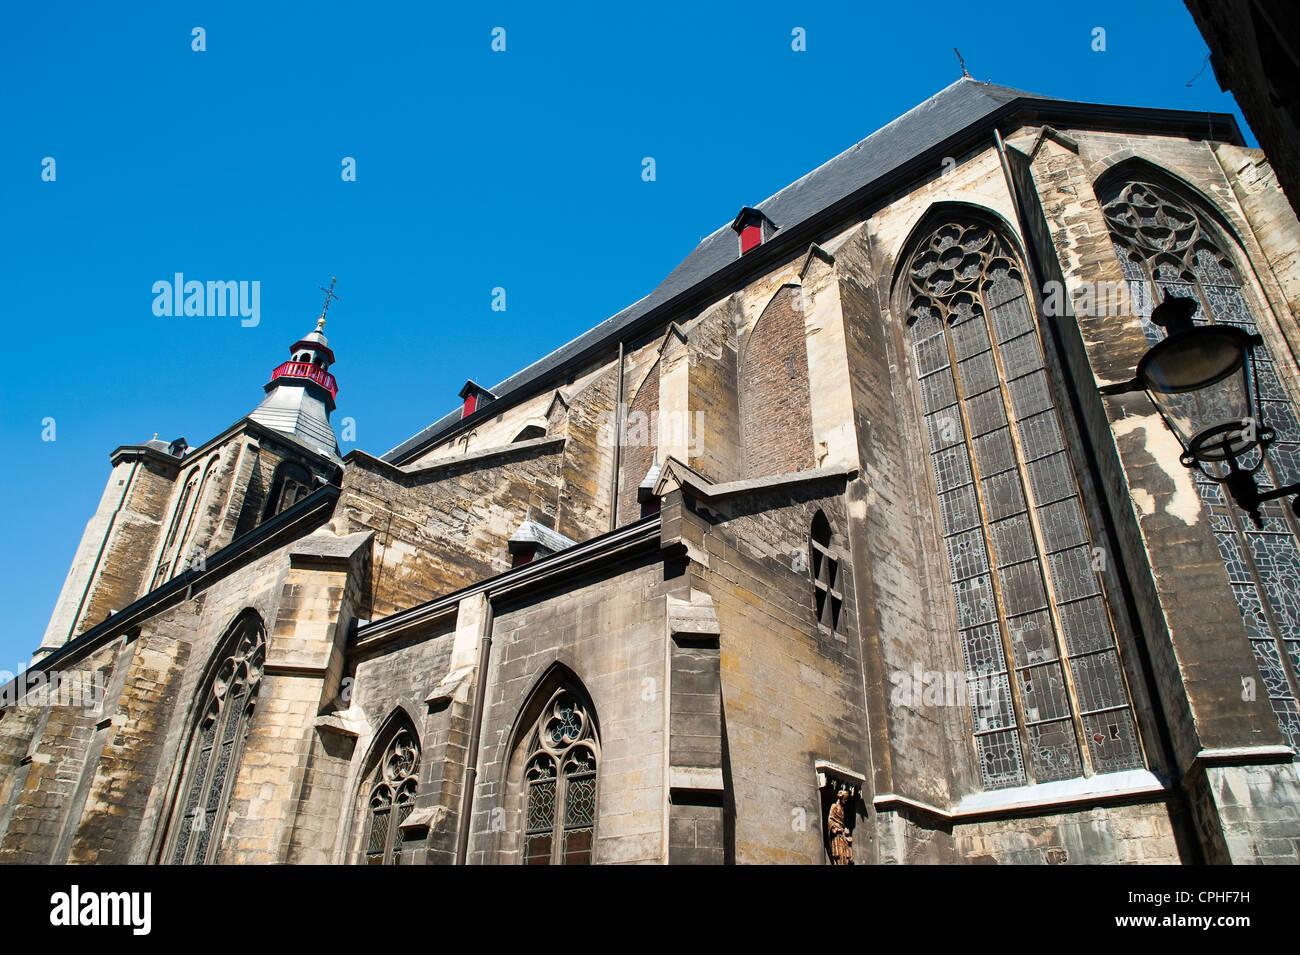 Sint Matthias Kerk (Saint Matthew's church), Maastricht, Limburg, The Netherlands, Europe. Stock Photo